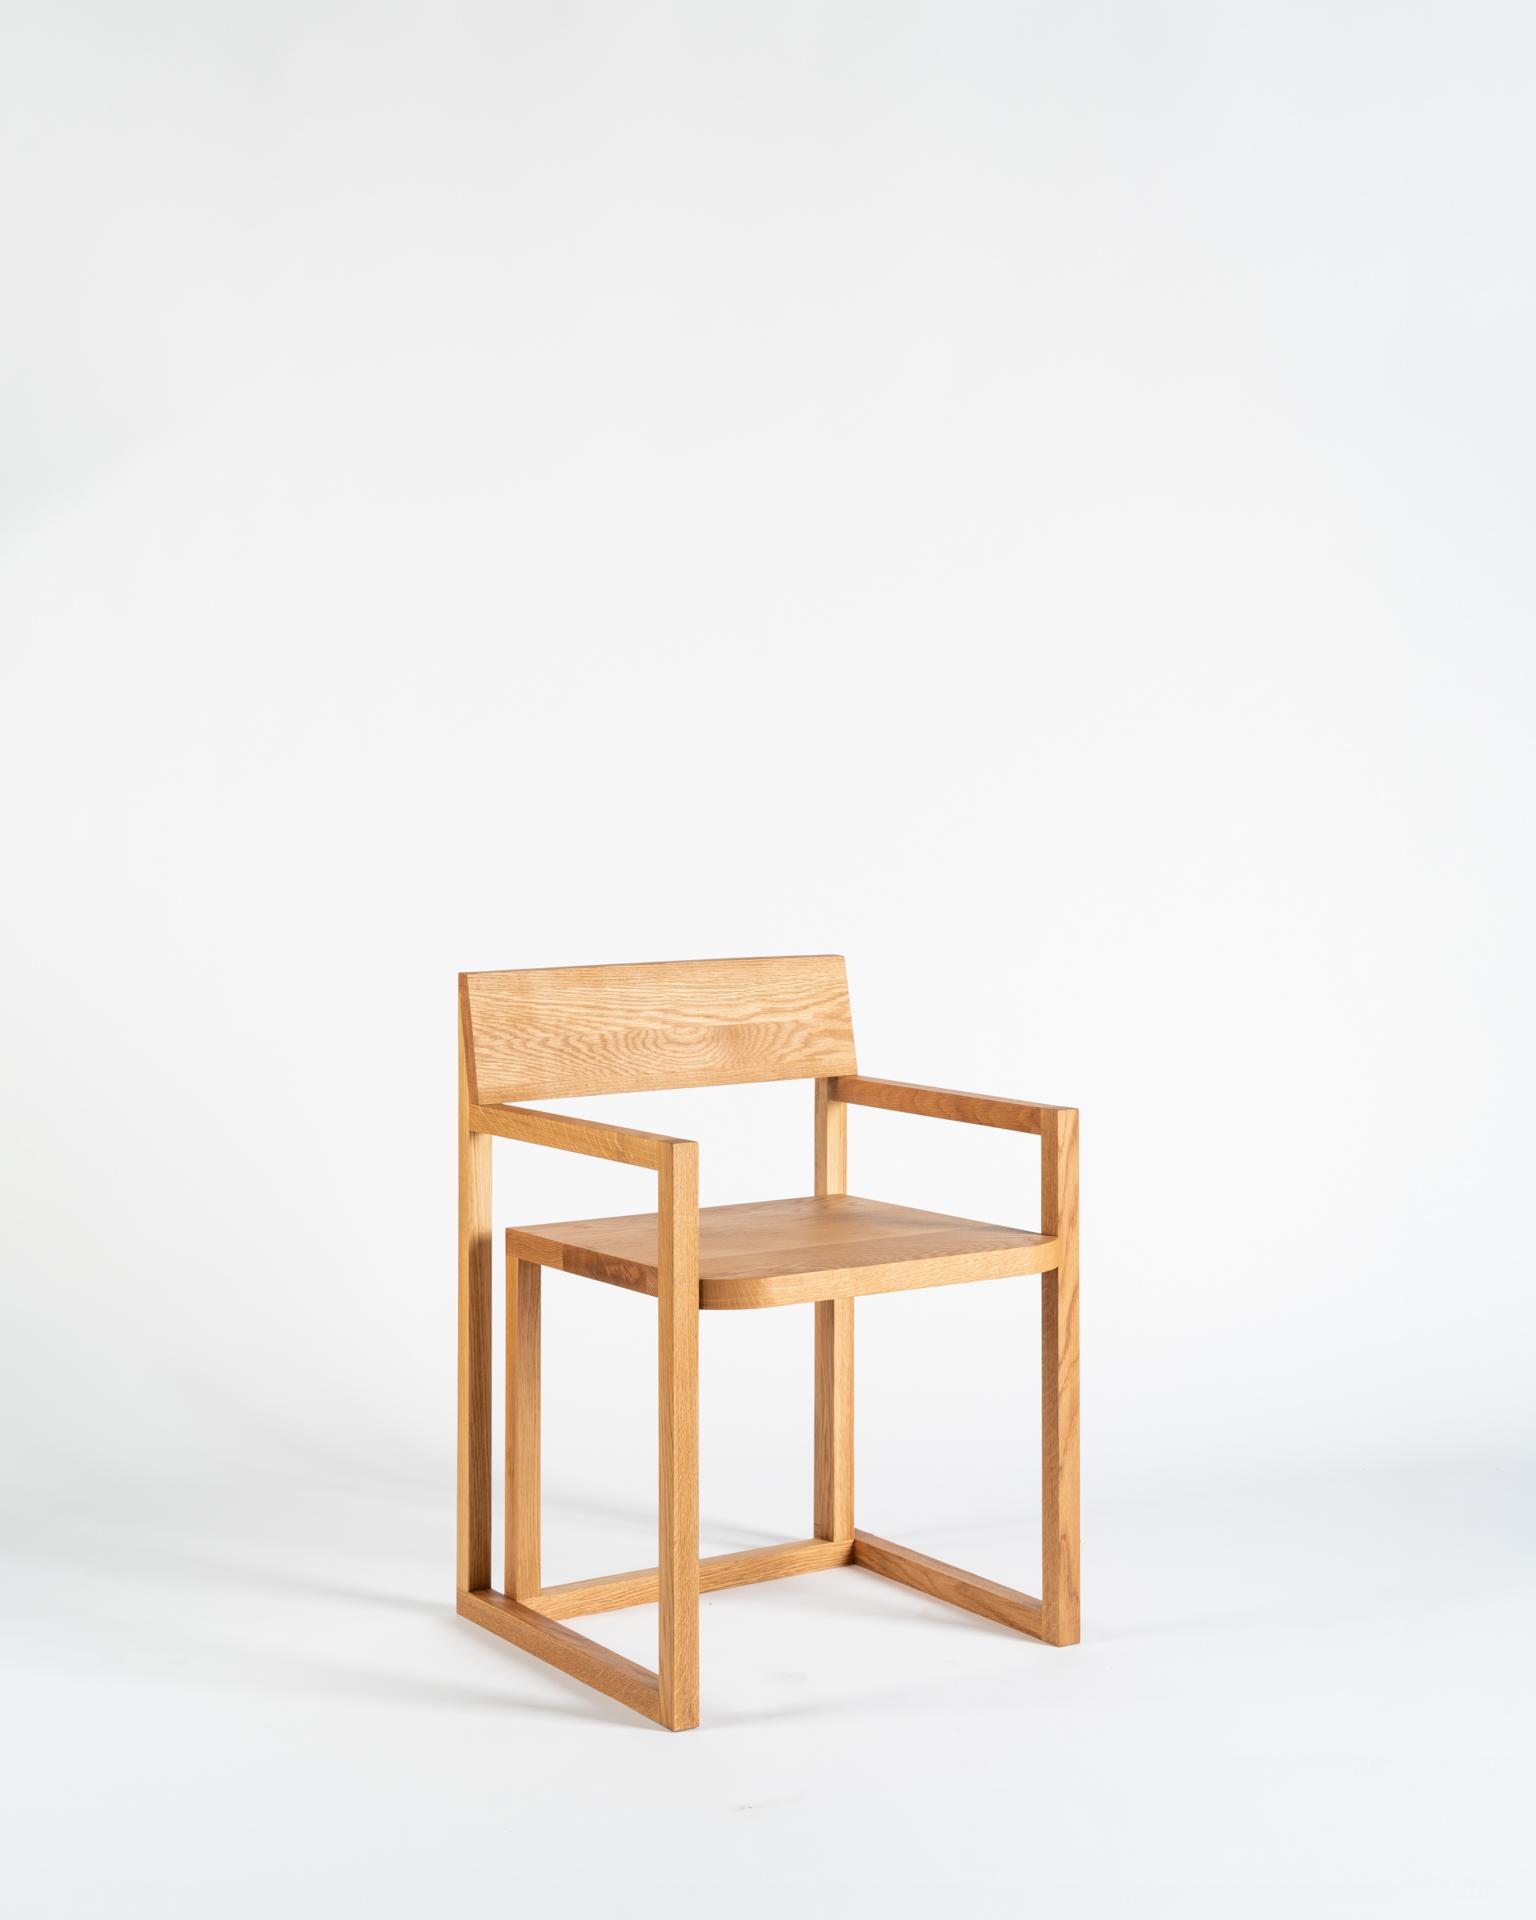 Furniture-web-1.jpg